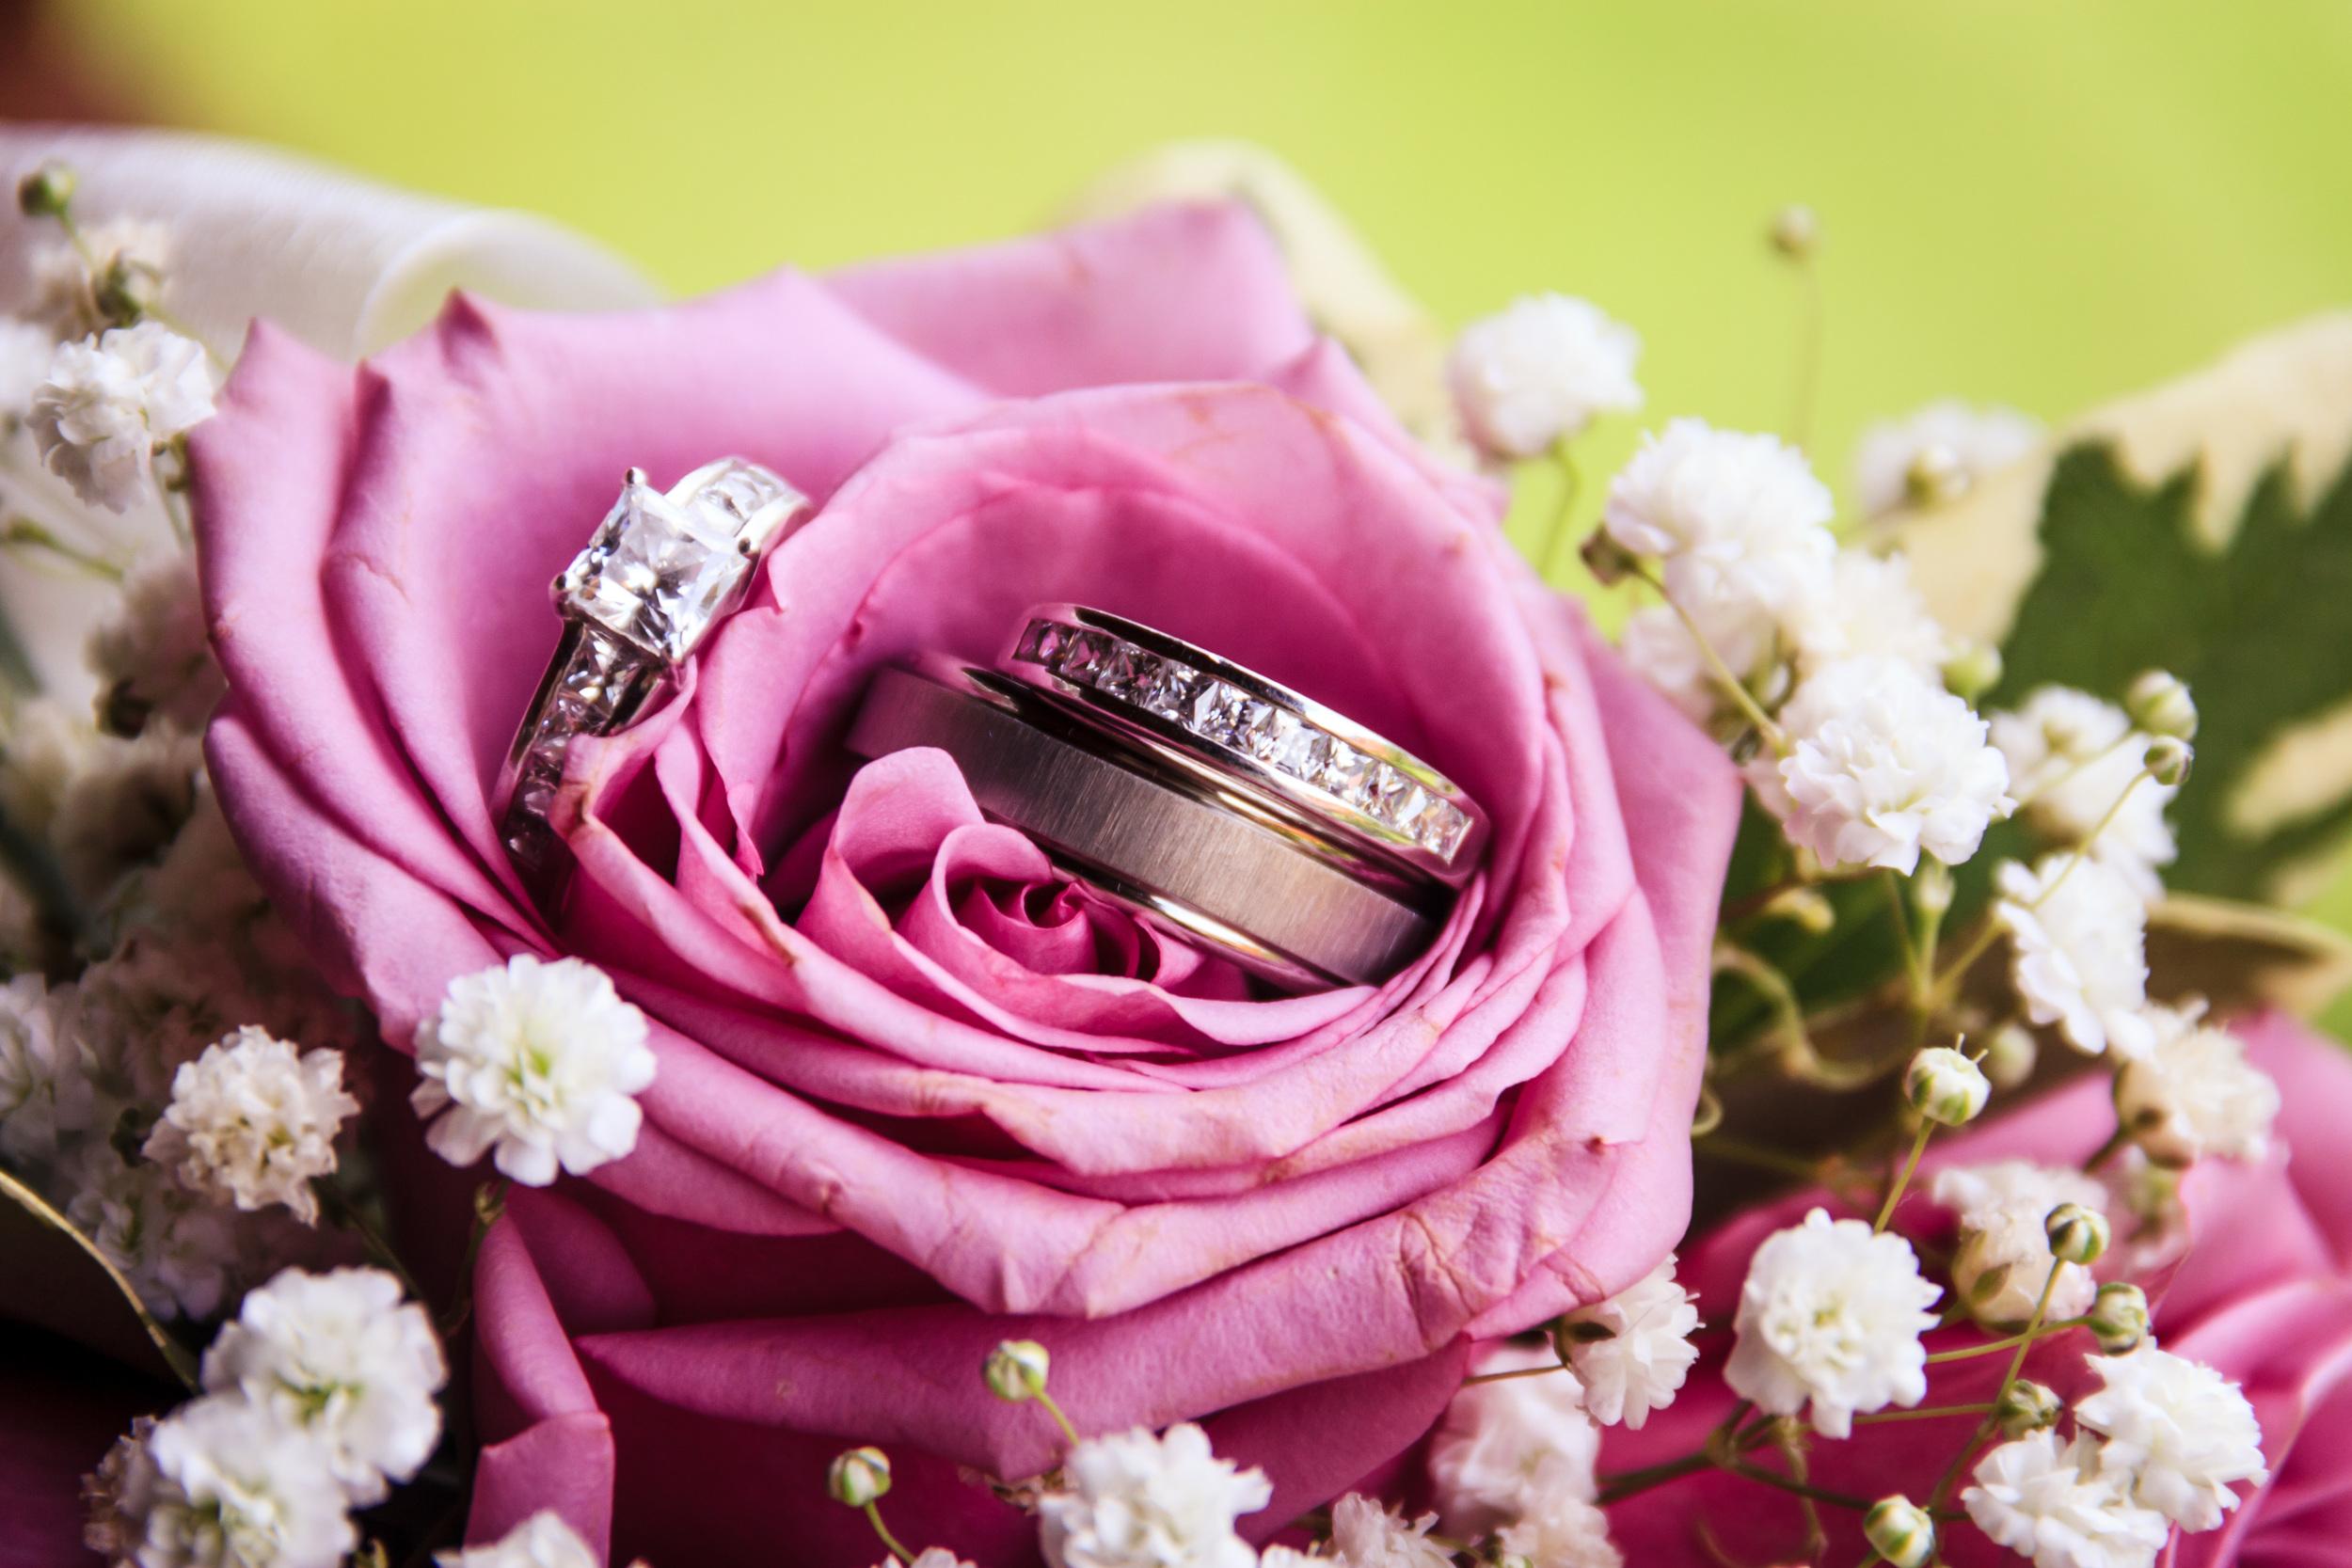 professional-candids-details-wedding-ceremony.jpg